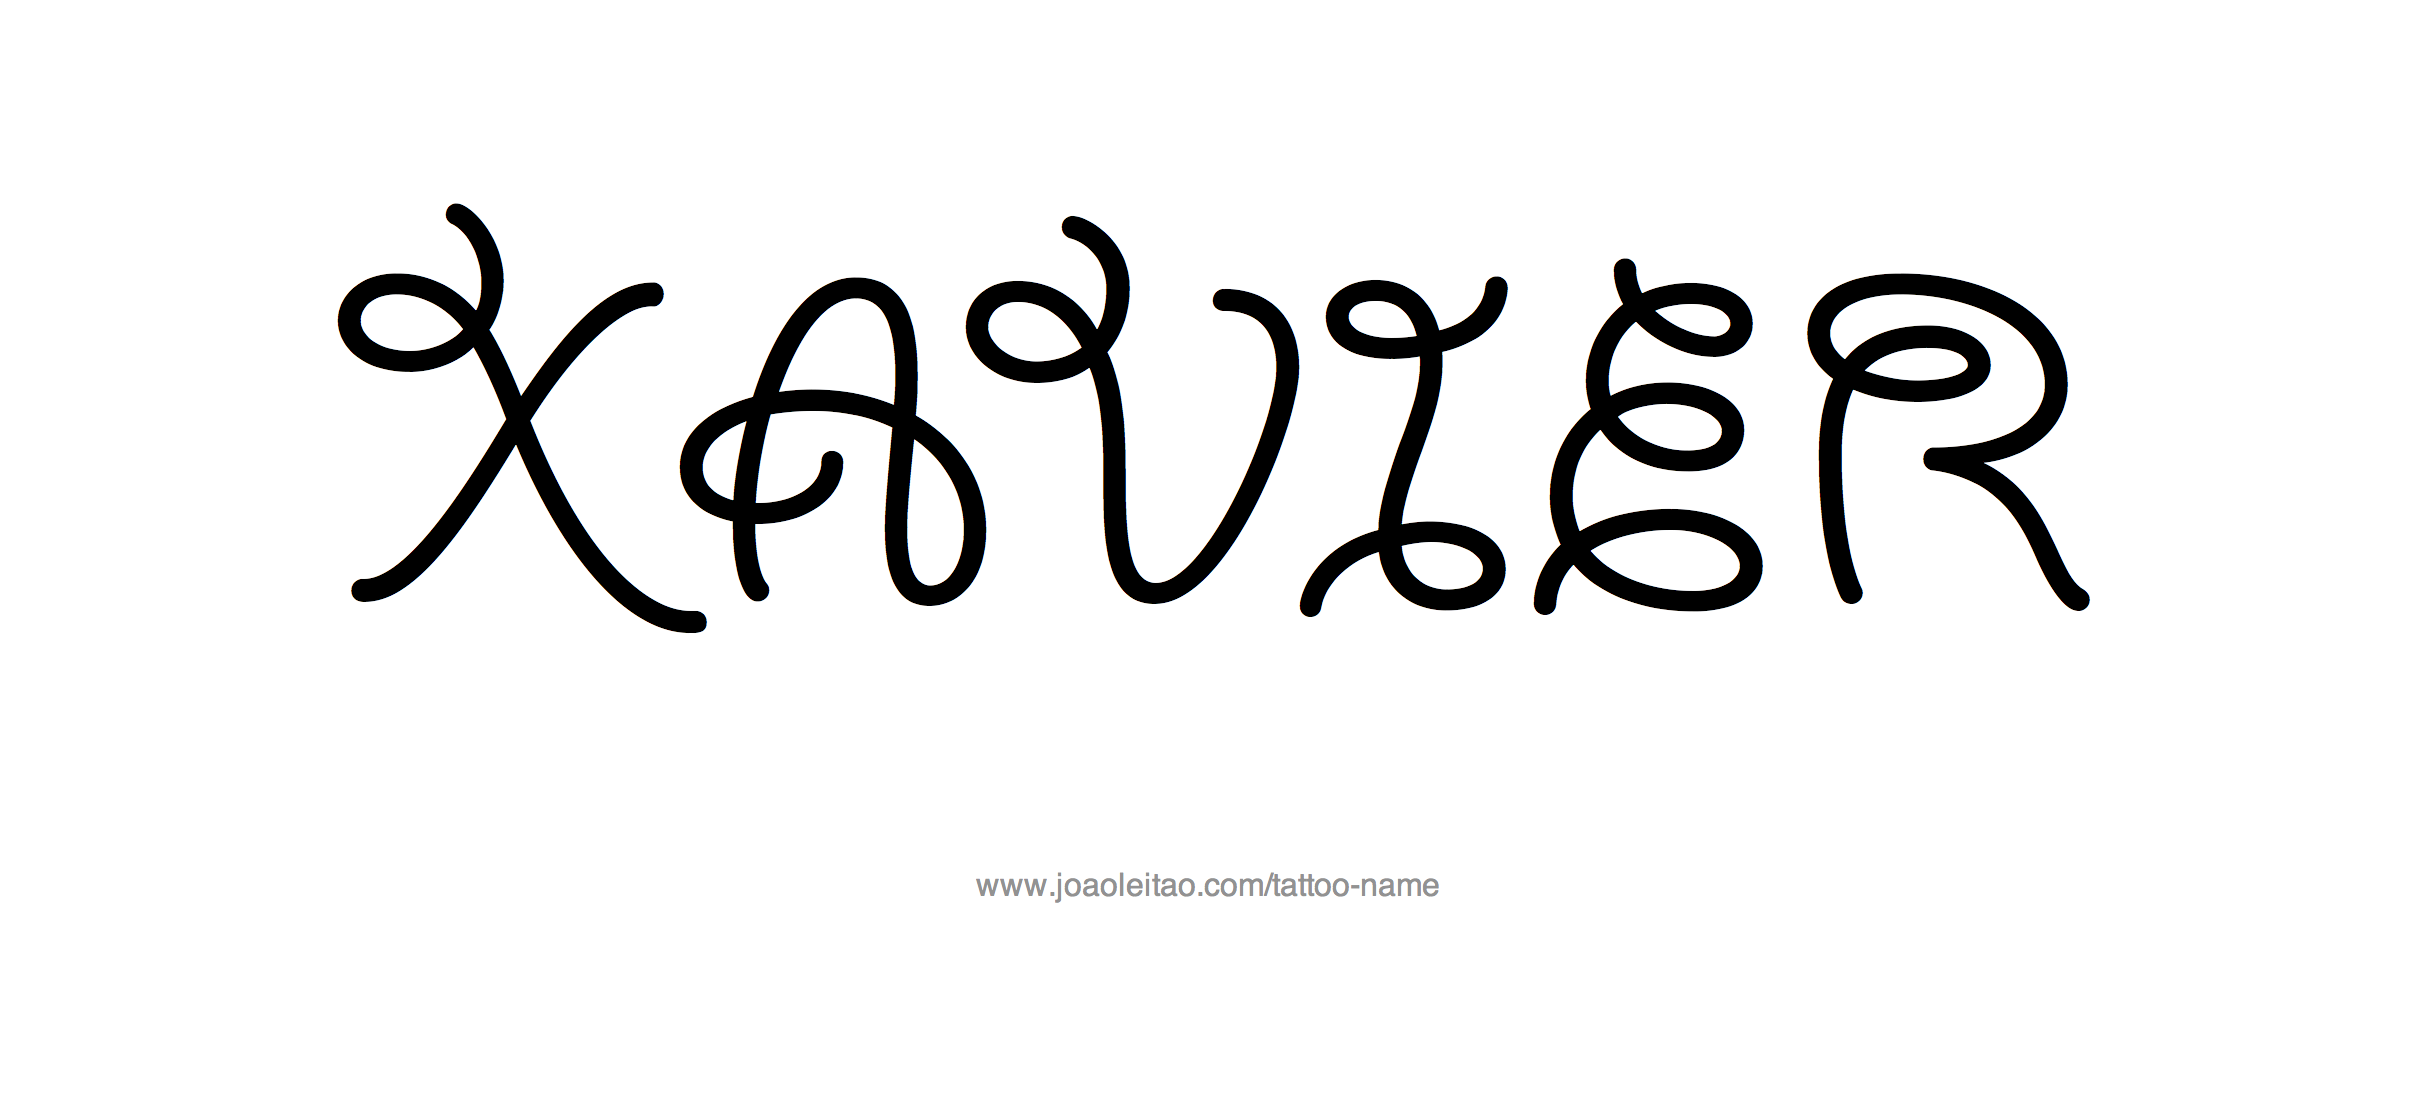 Tattoo Design Name Xavier